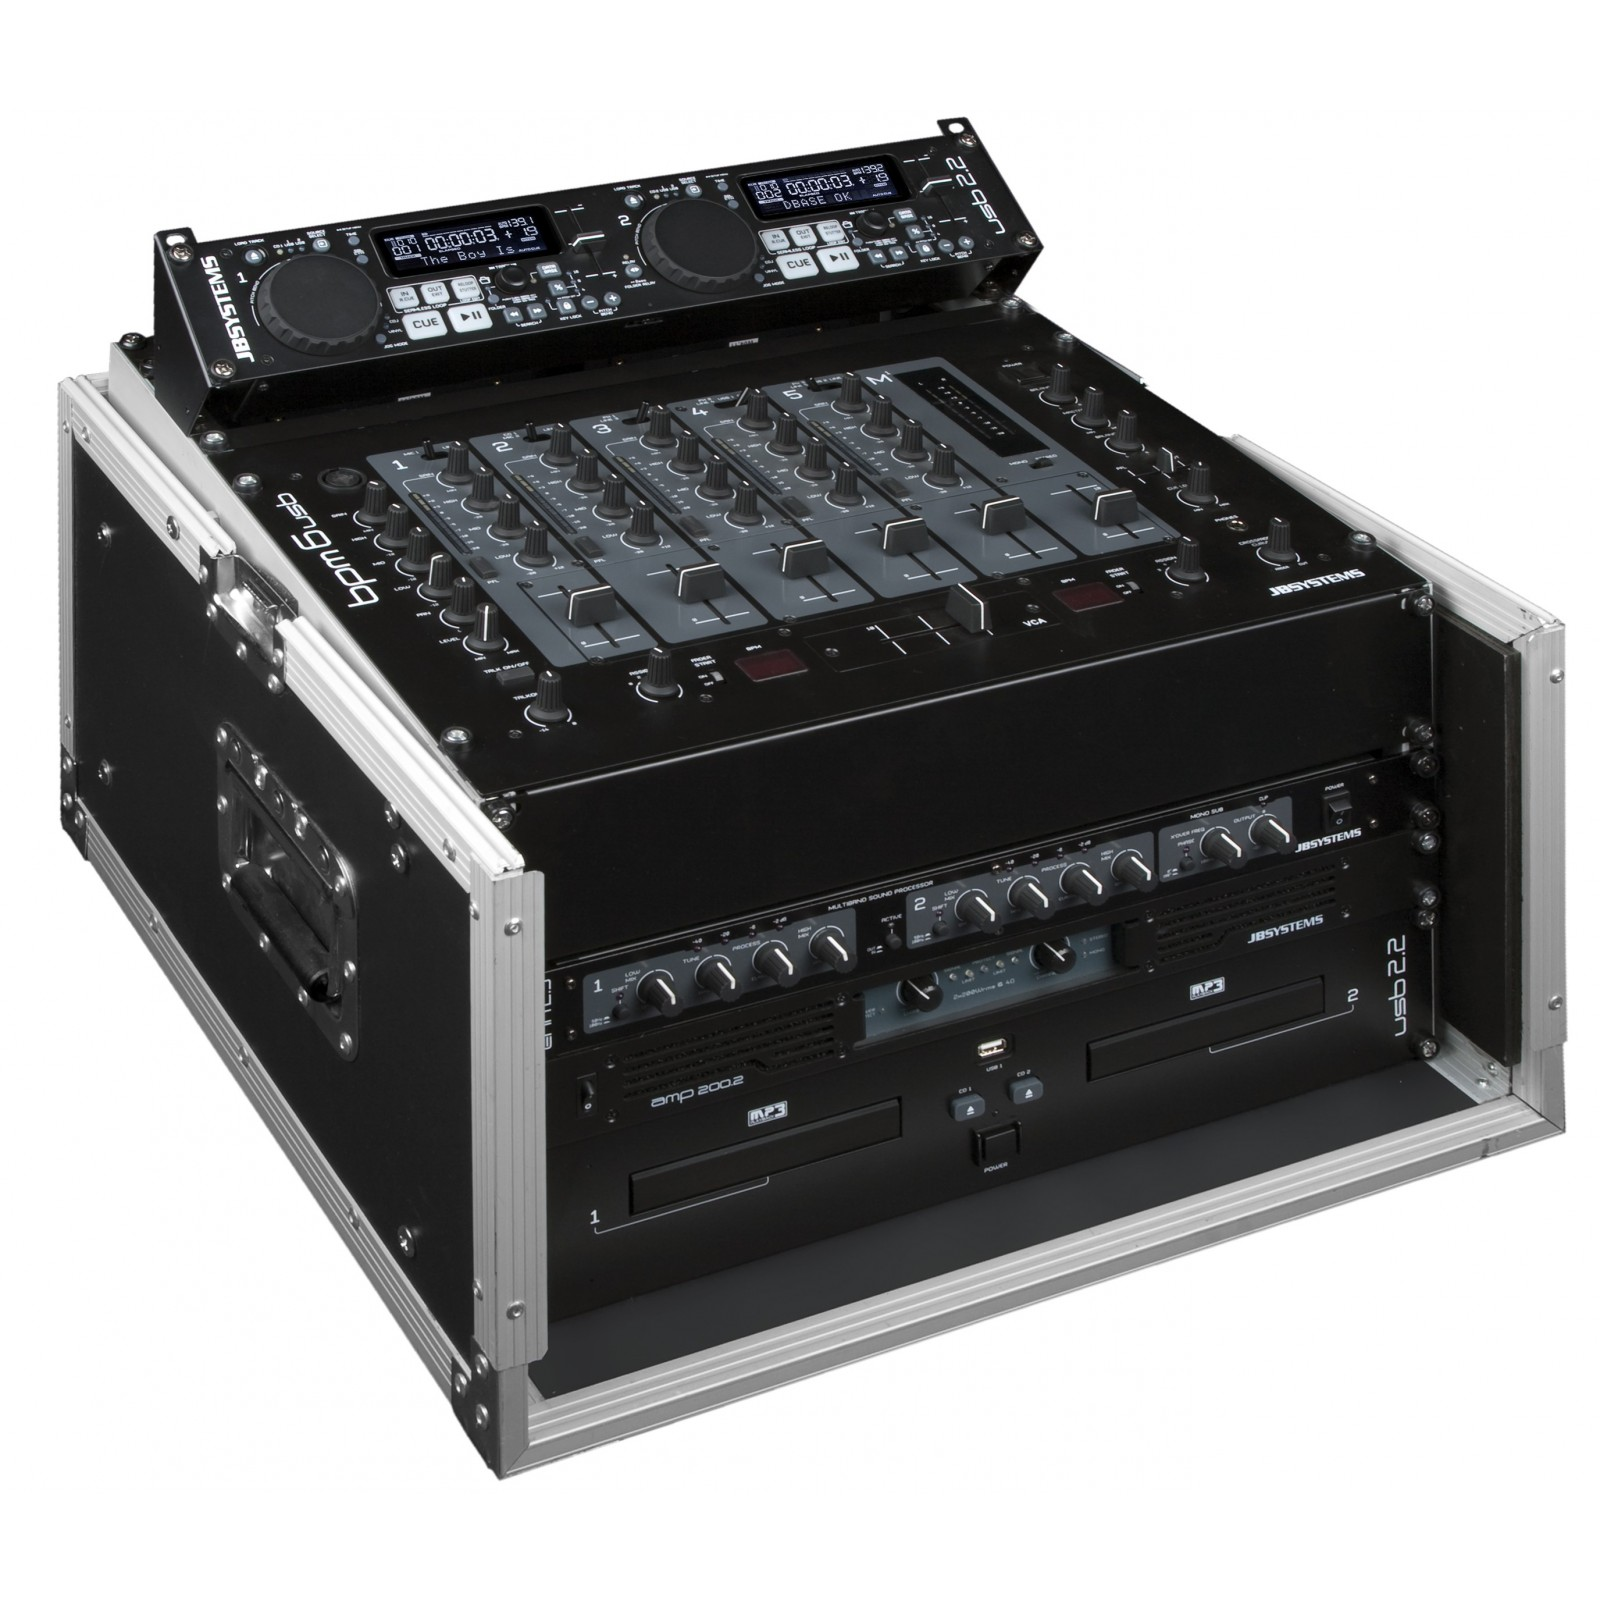 Jb Systems Dj Case 10 6u